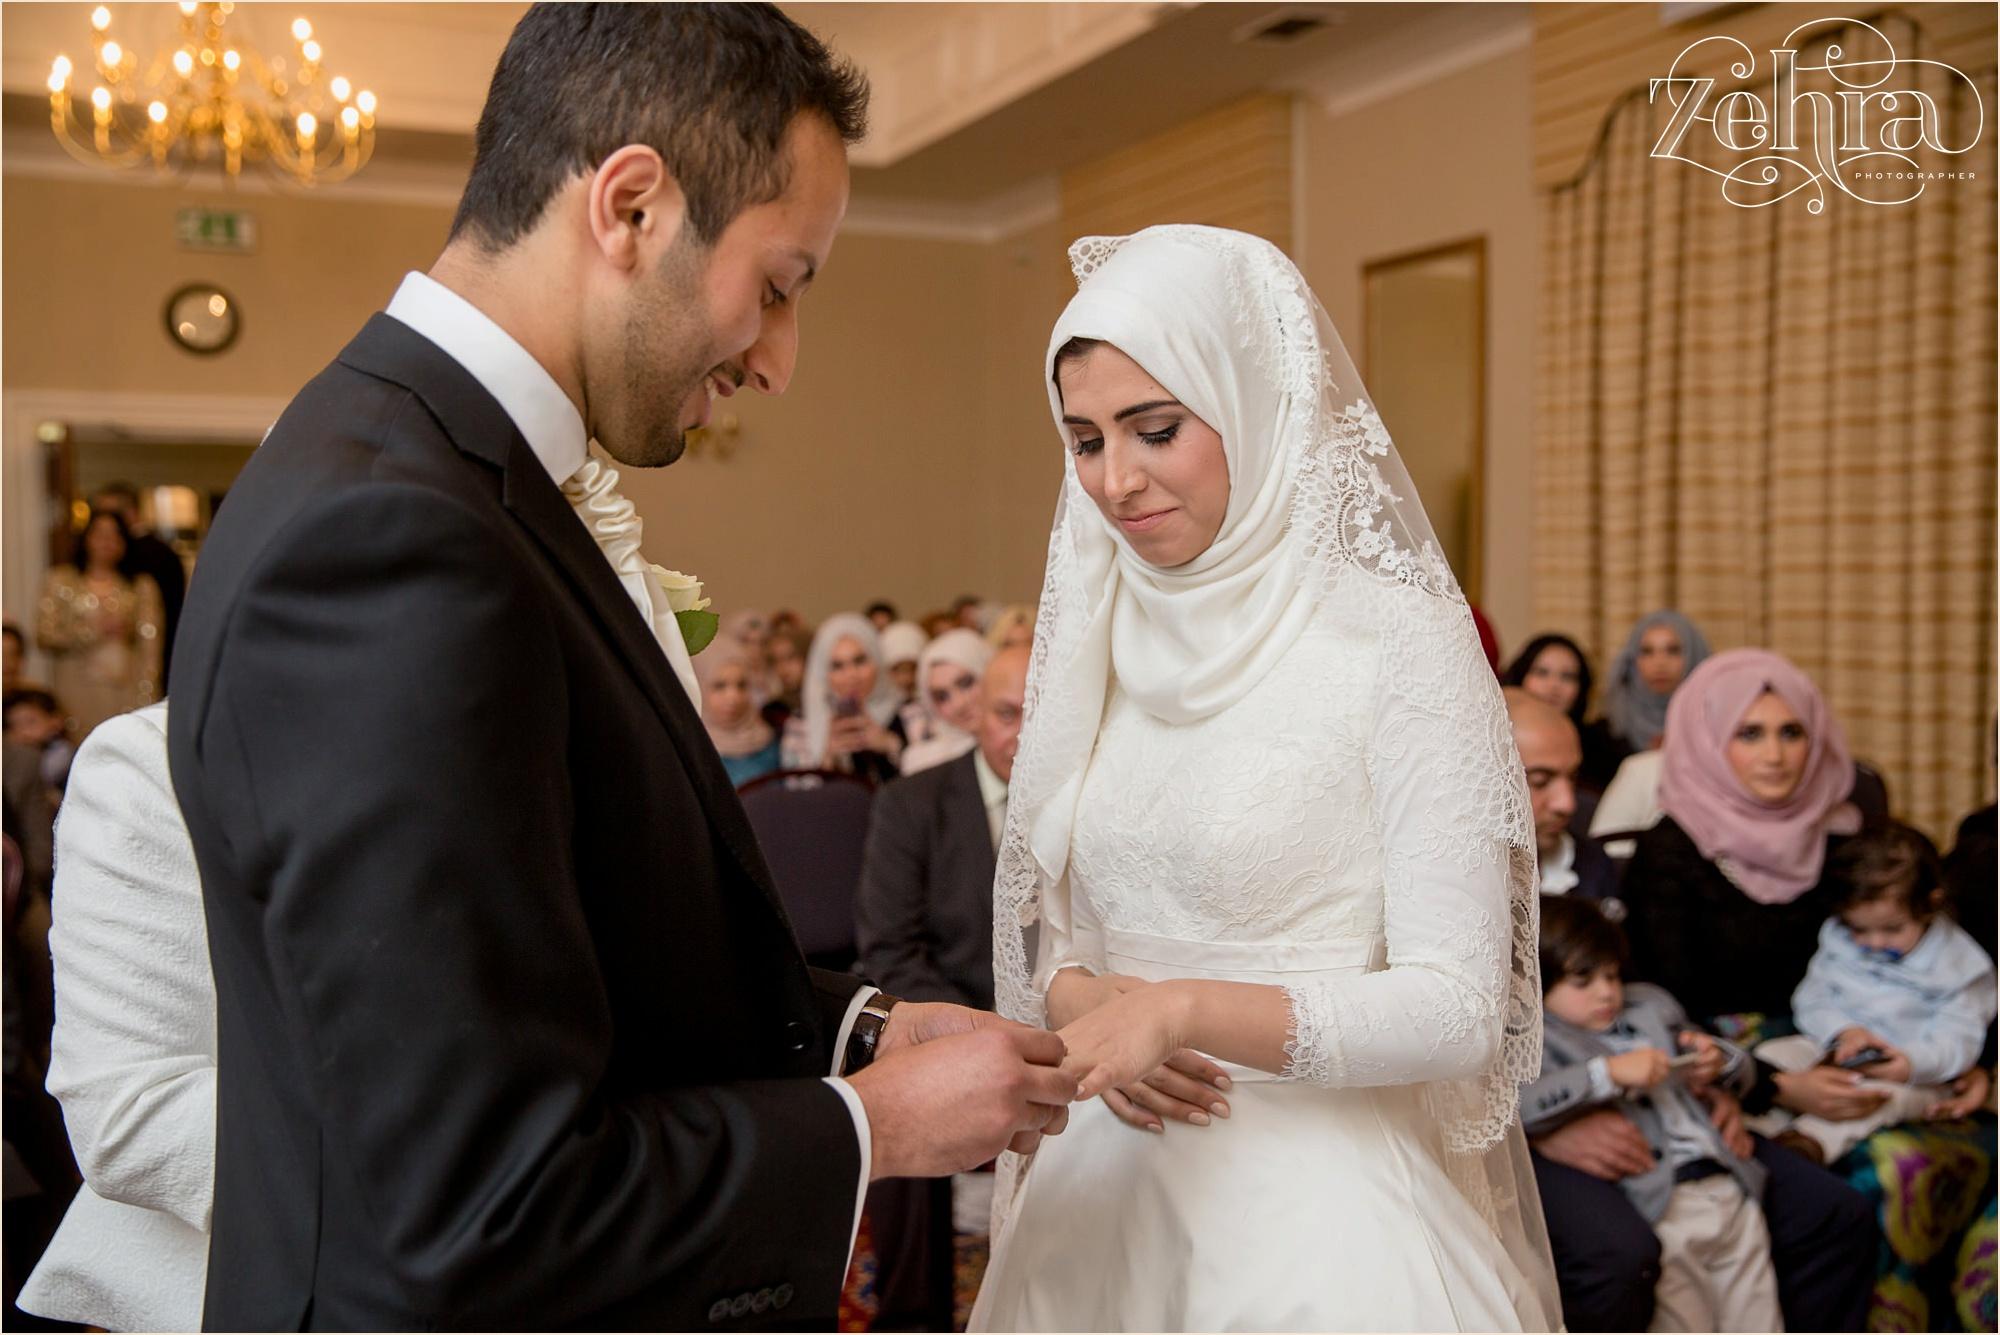 jasira manchester wedding photographer_0074.jpg